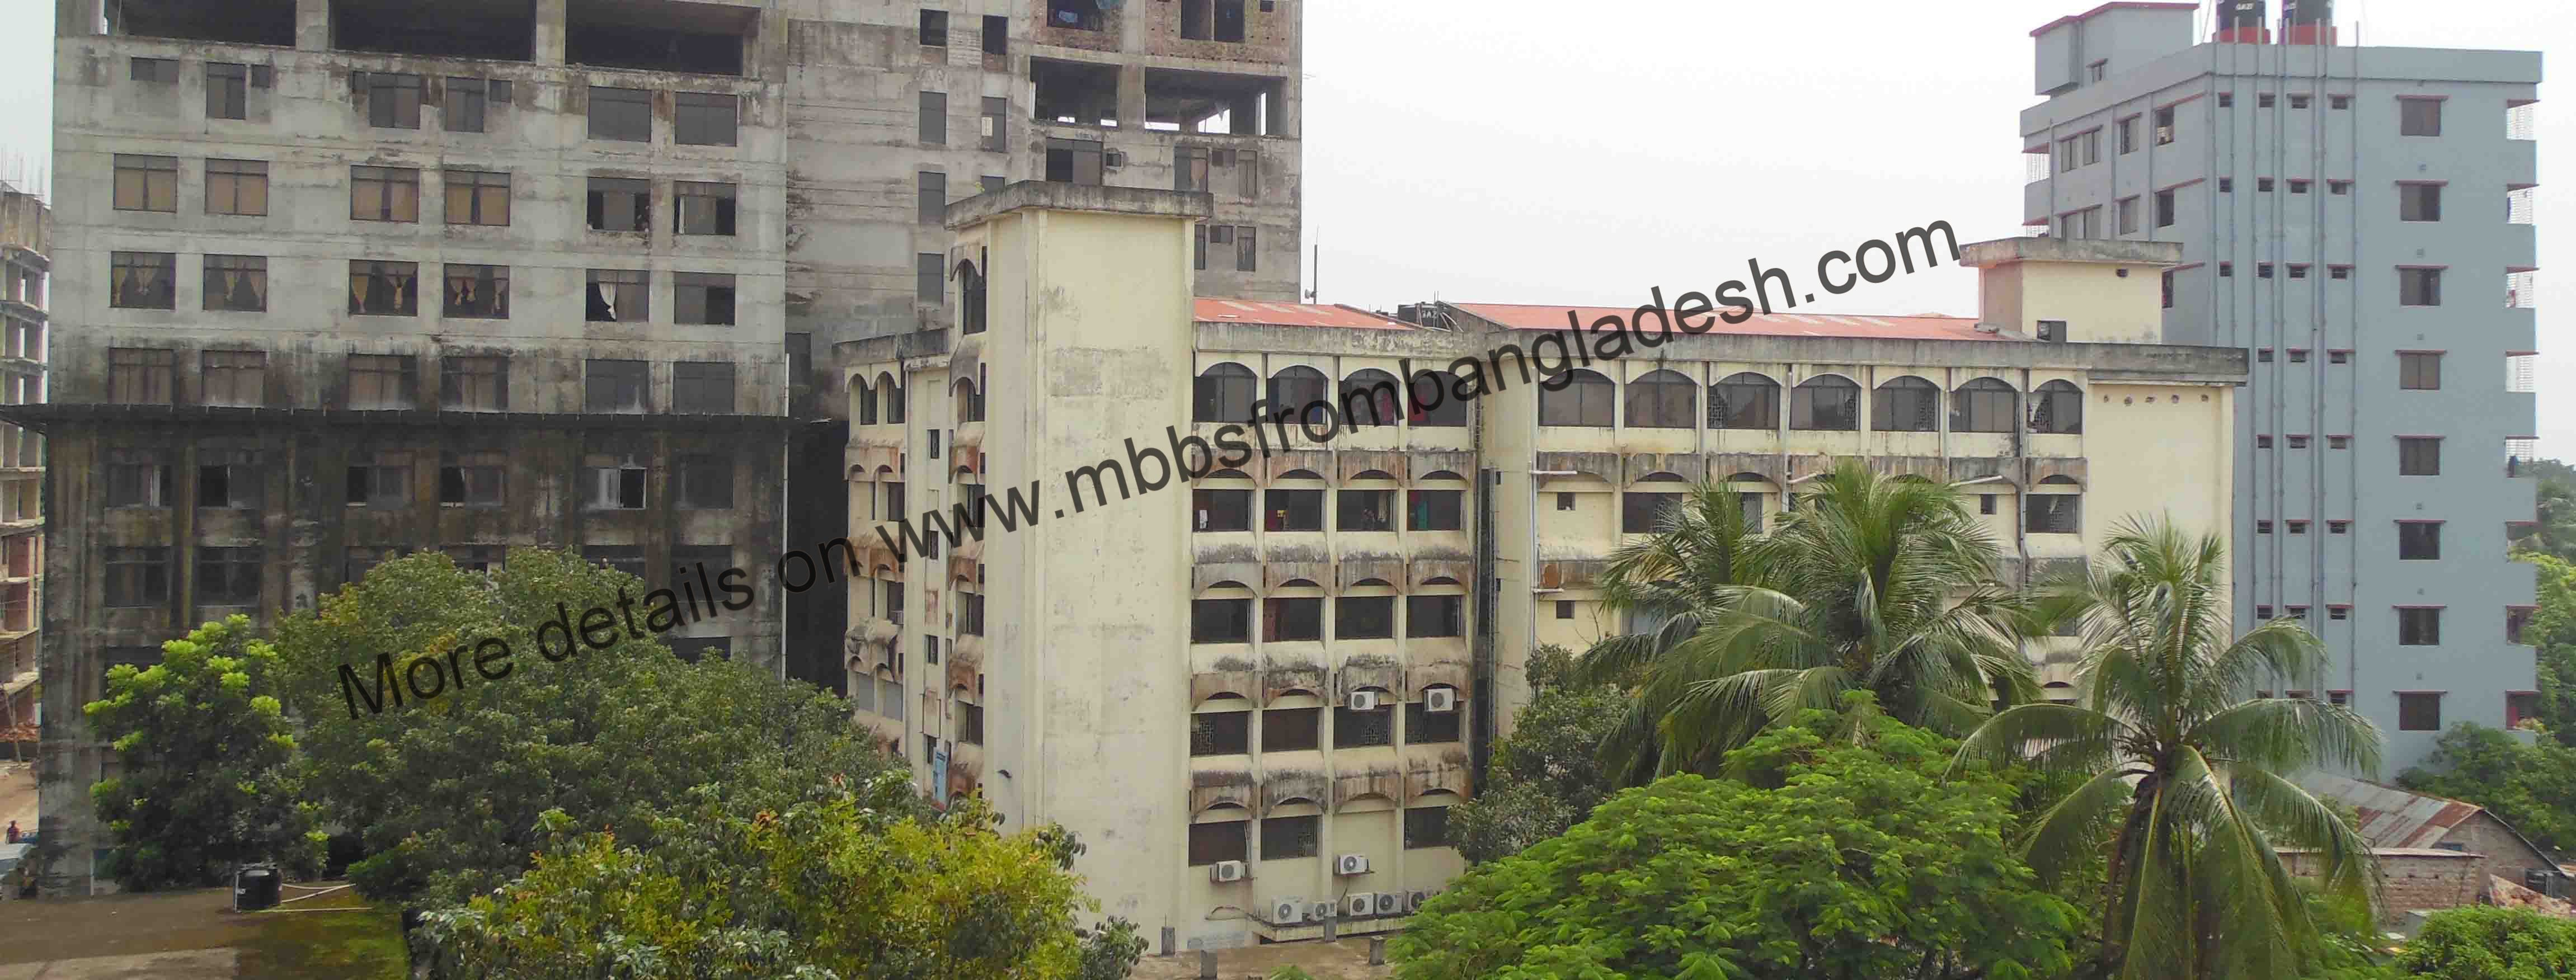 Diabetic Association Medical College, Faridpur – MBBS in Bangladesh